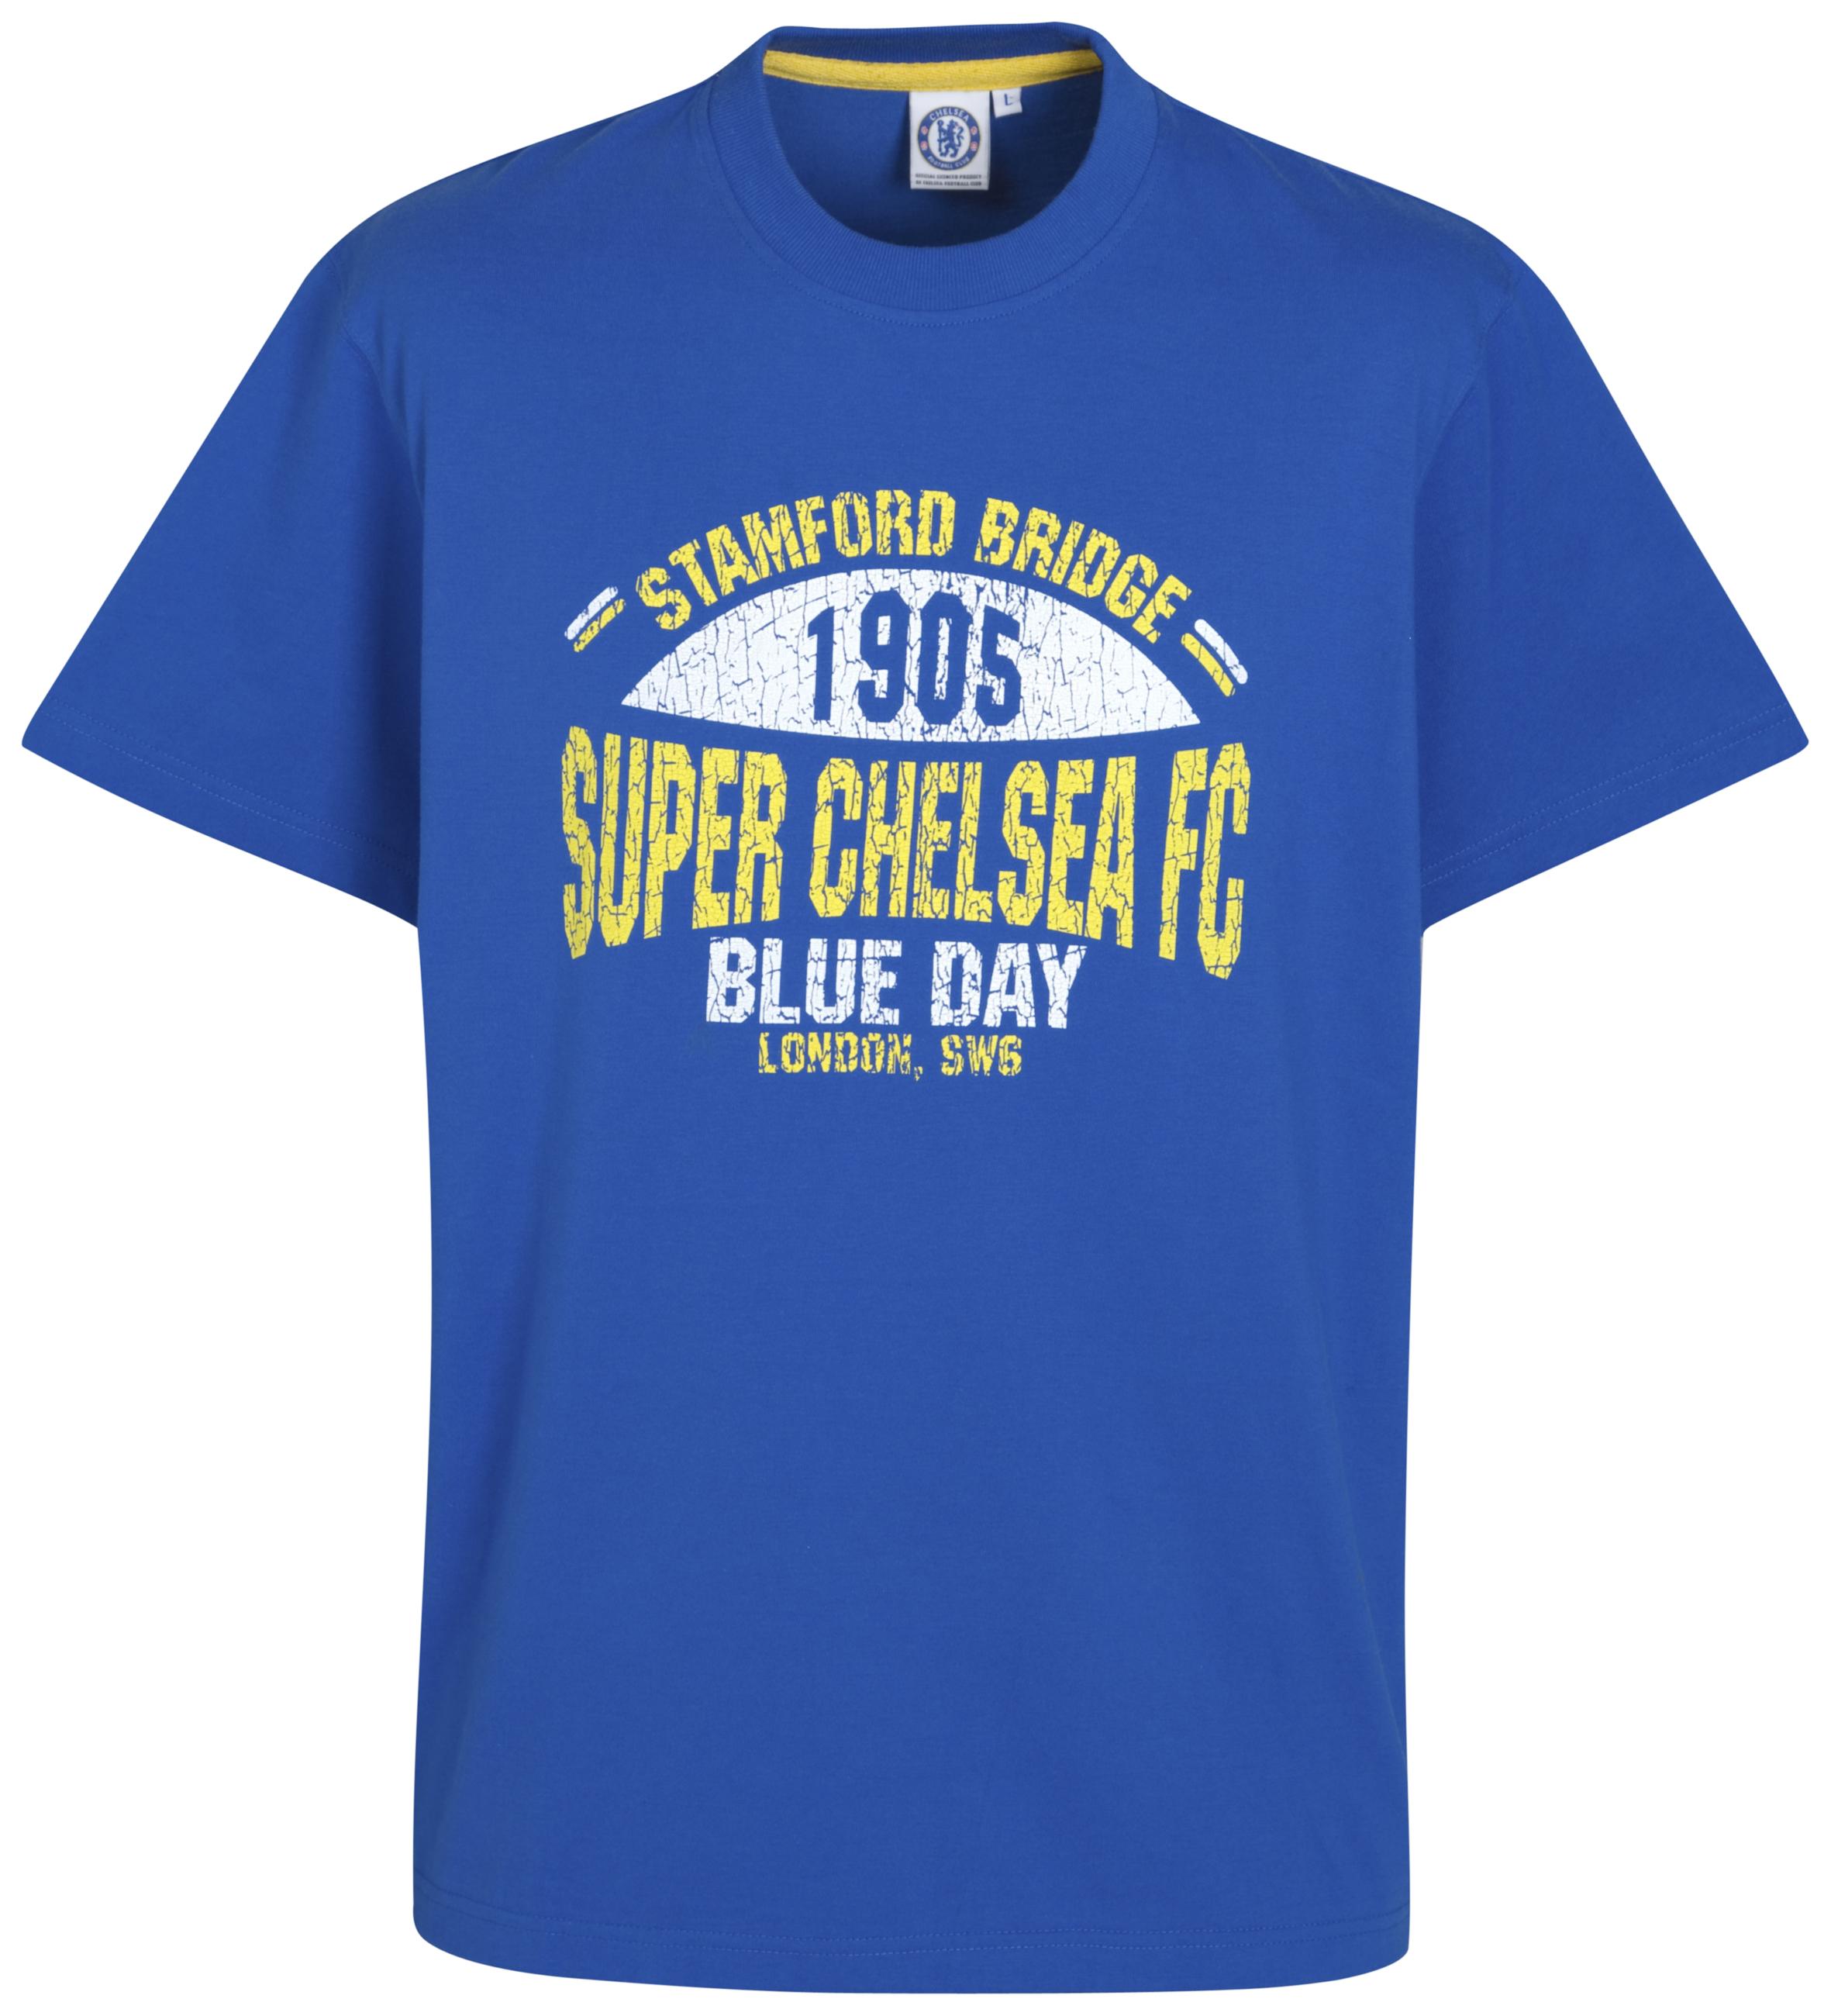 Chelsea Super Chelsea retro Graphic T Shirt Reflex Blue